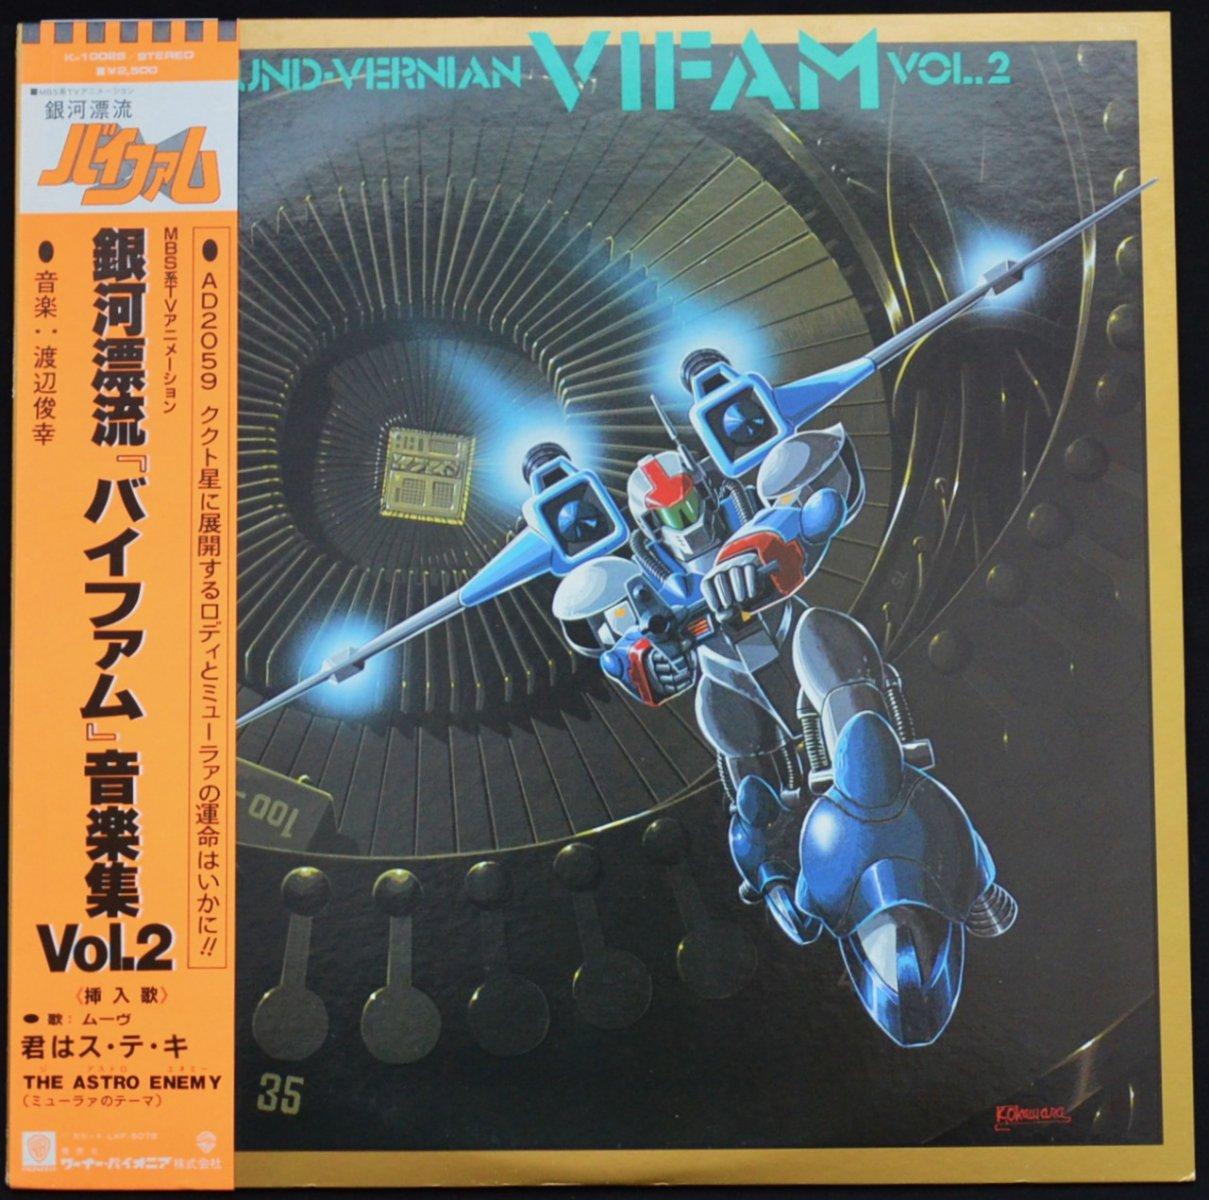 O.S.T. (渡辺俊幸 TOSHIYUKI WATANABE) / 銀河漂流「バイファム」- 音楽集 VOL.2 / ROUND-VERNIAN VIFAM VOL.2 (LP)